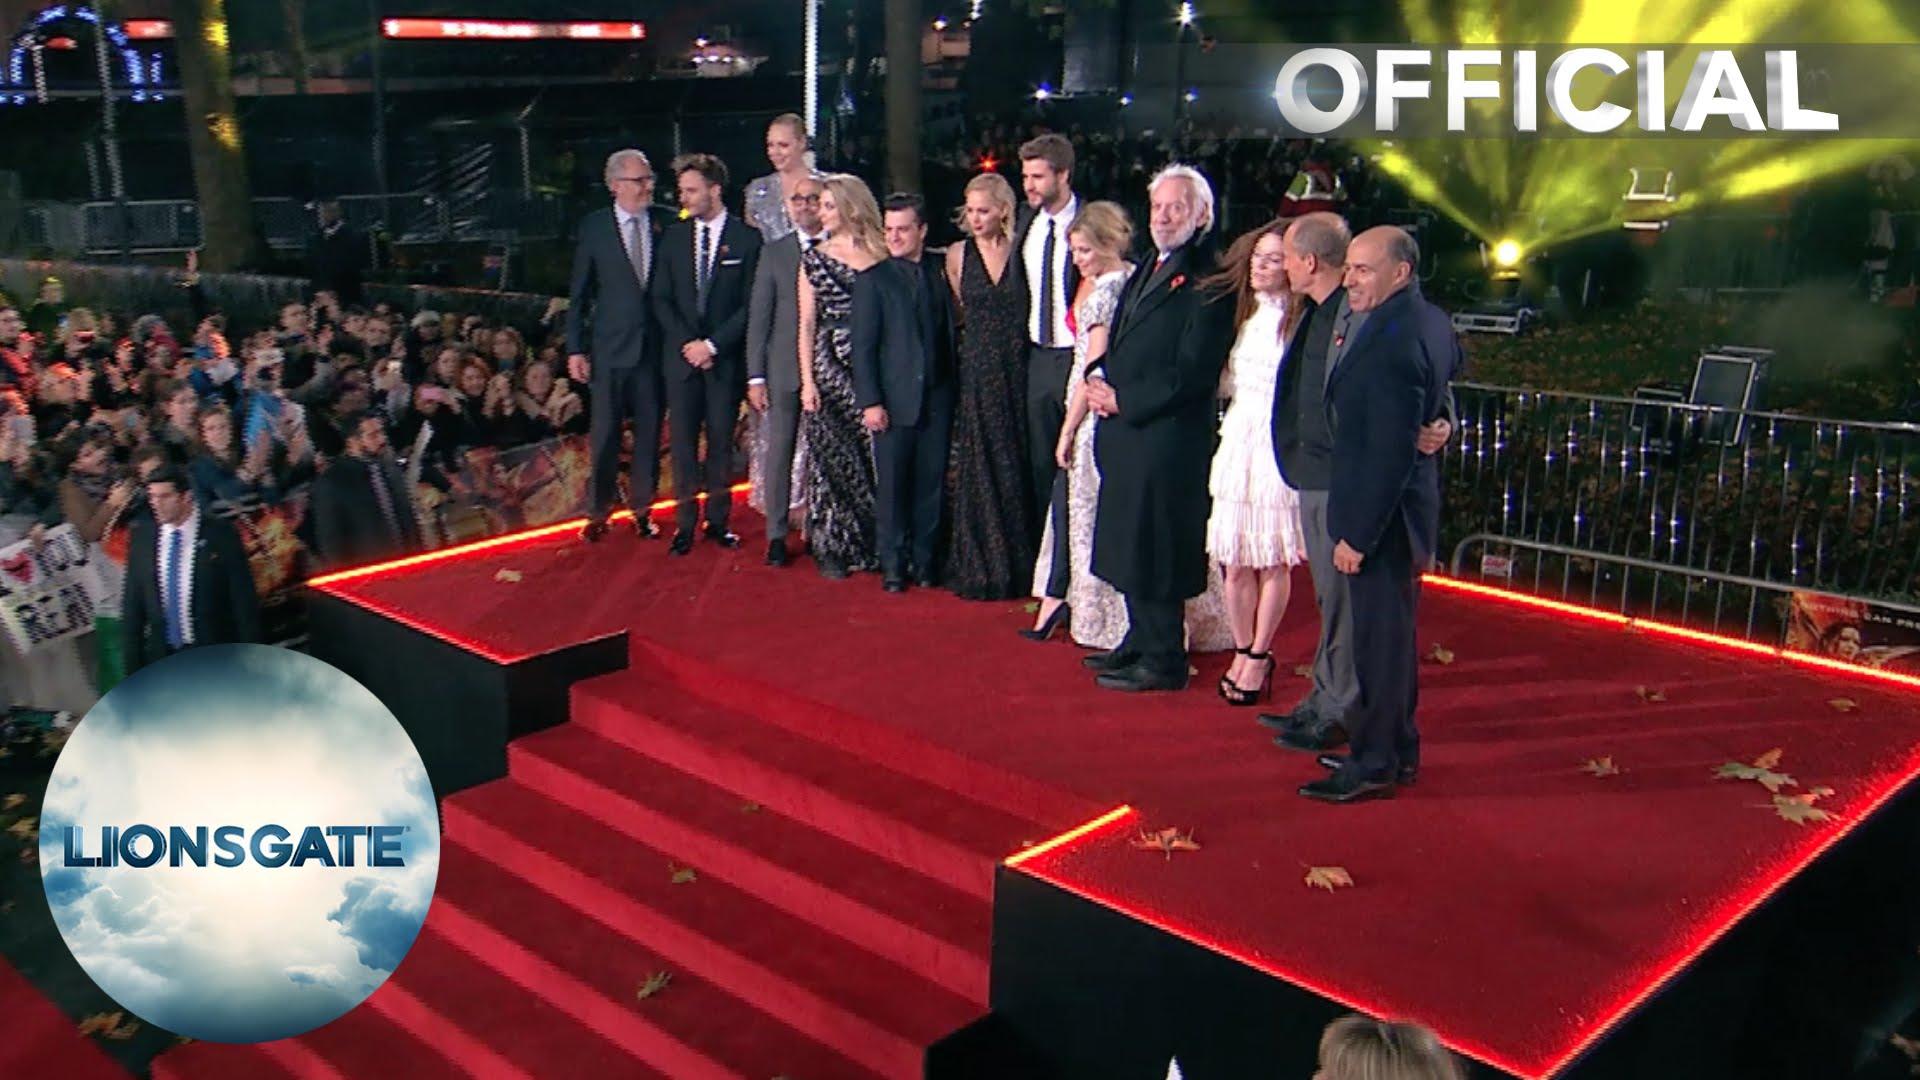 UK PREMIERE – The Hunger Games: Mockingjay Part 2